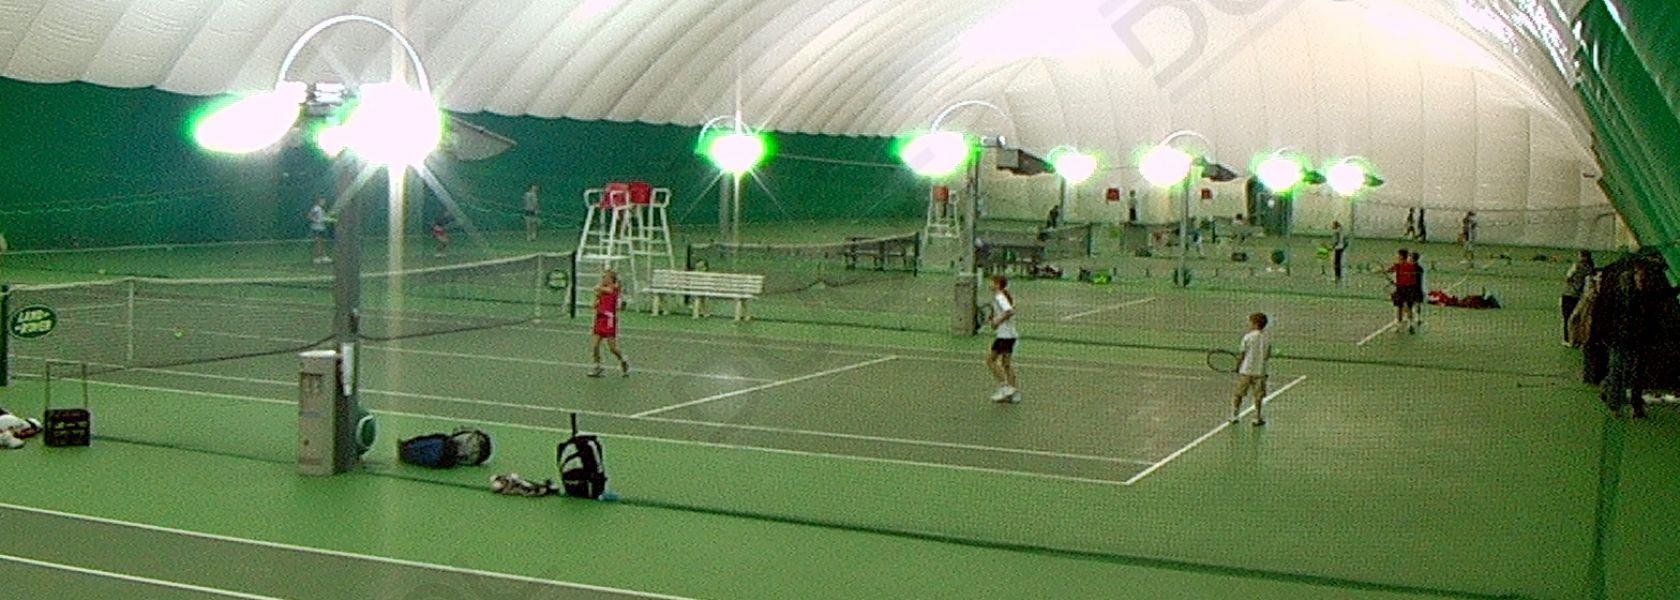 Tennis Airdome Oktober 2